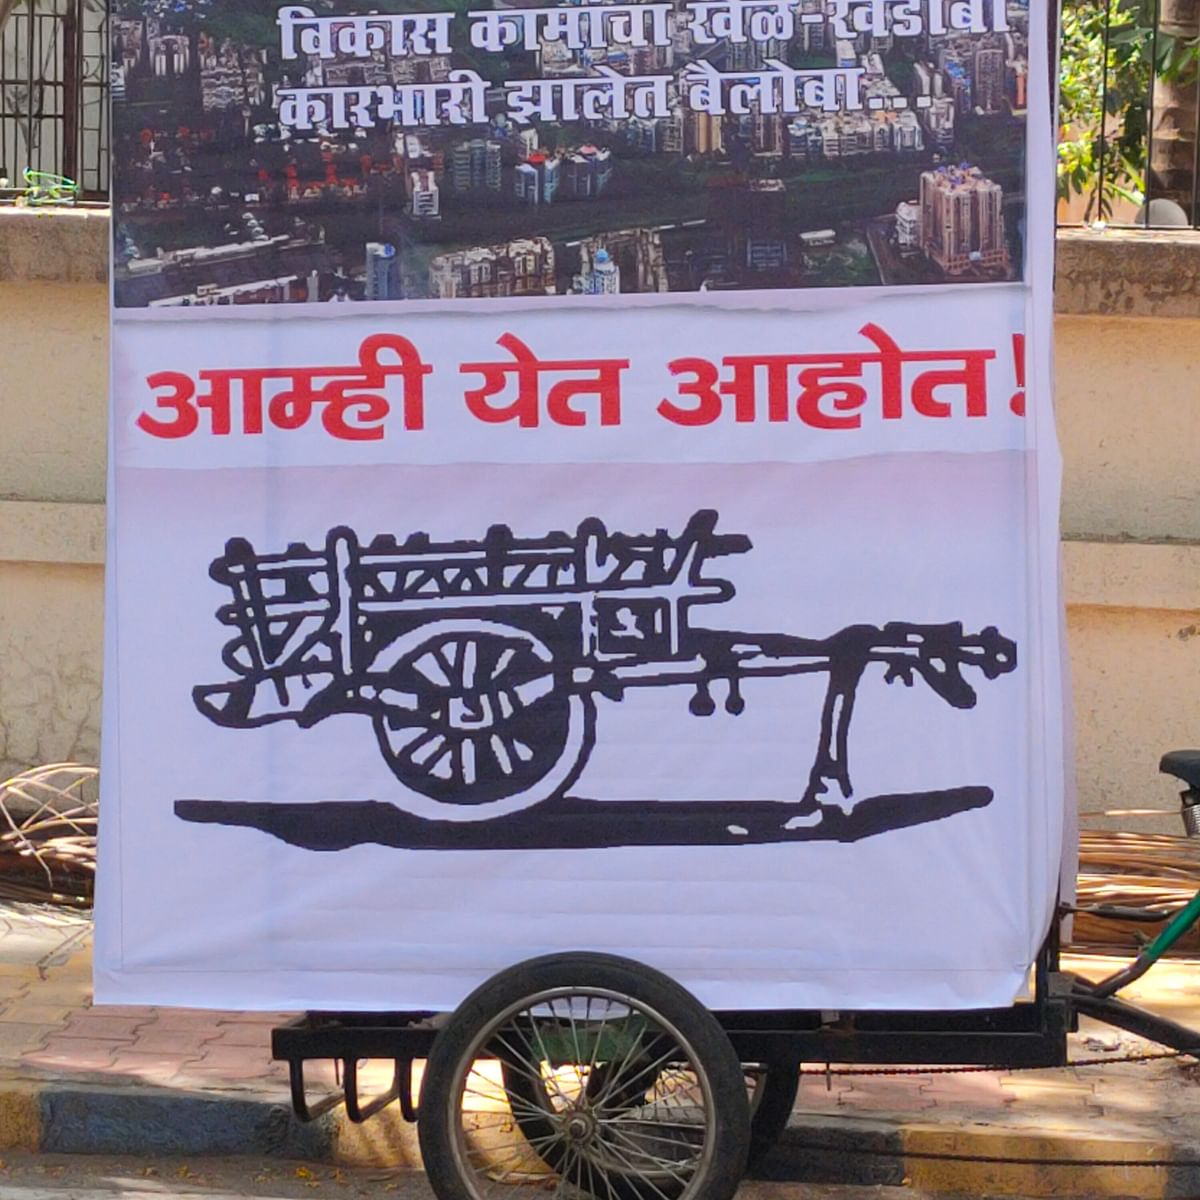 Mumbai: PWP to contest NMMC elections